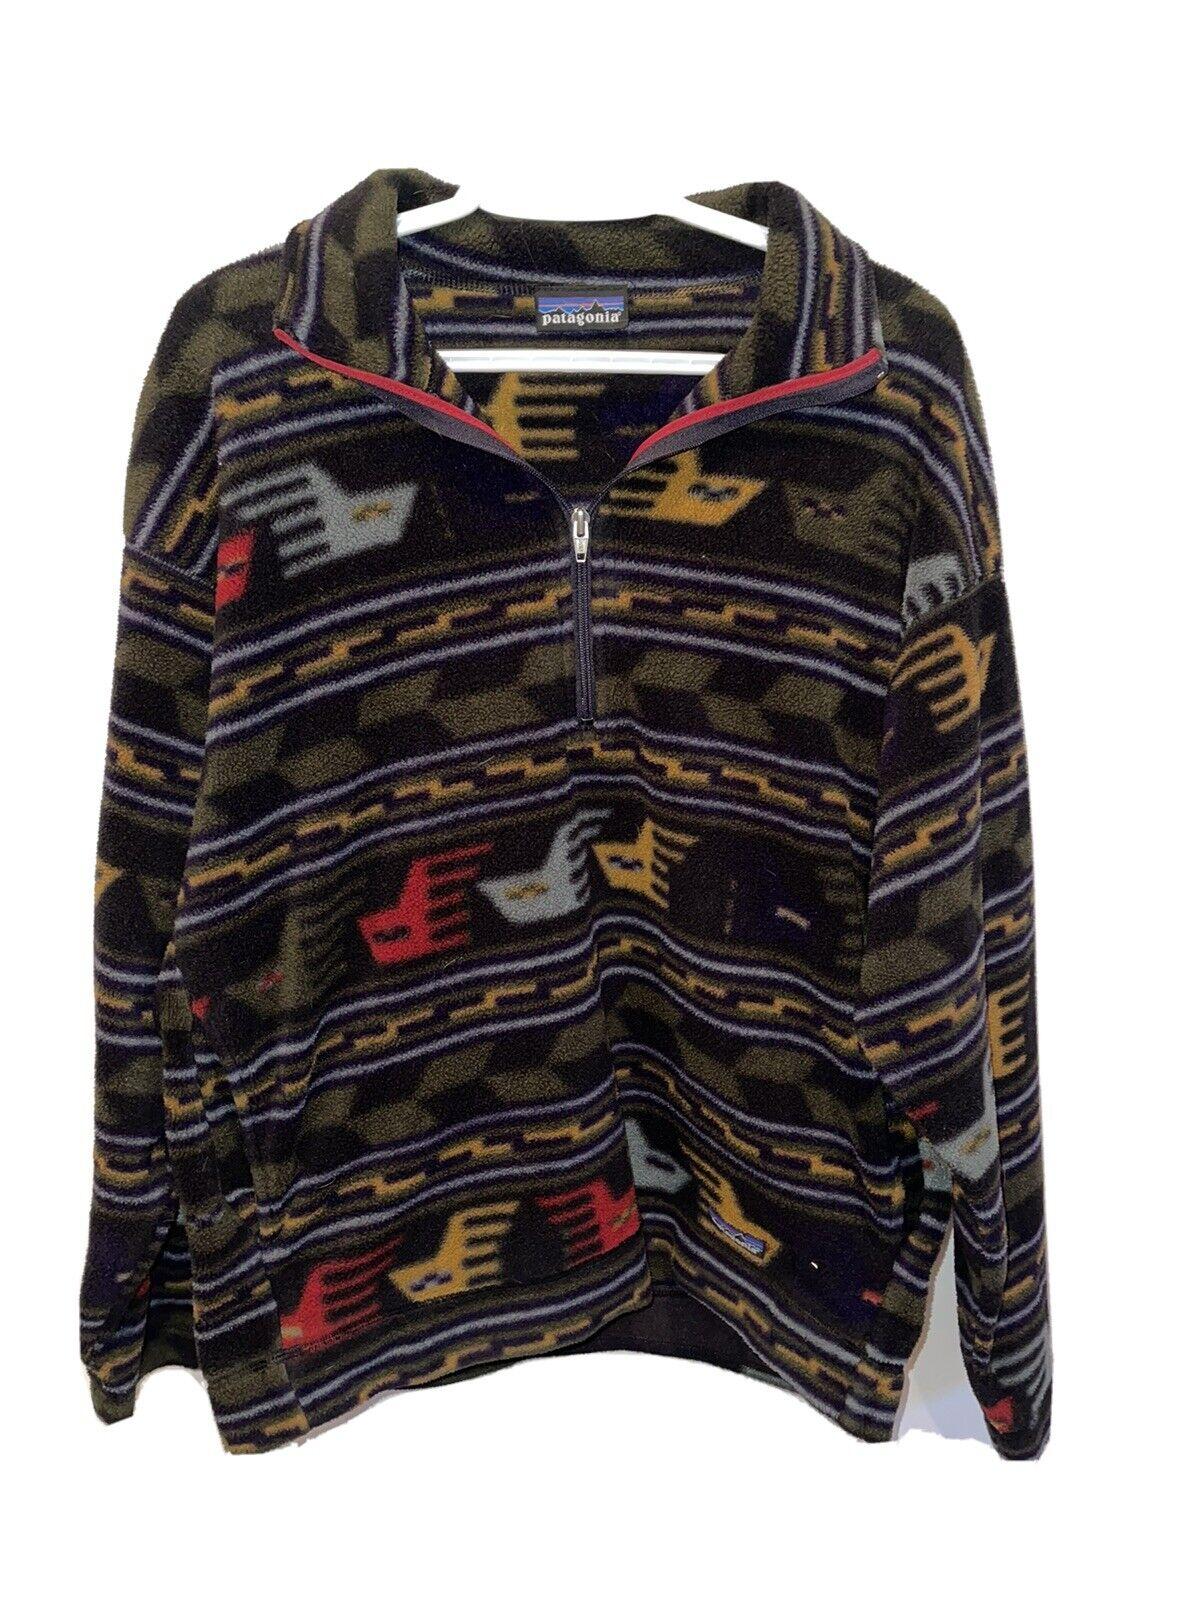 Rare Vintage Aztec Tribal Patagonia Jacket (80s o… - image 1